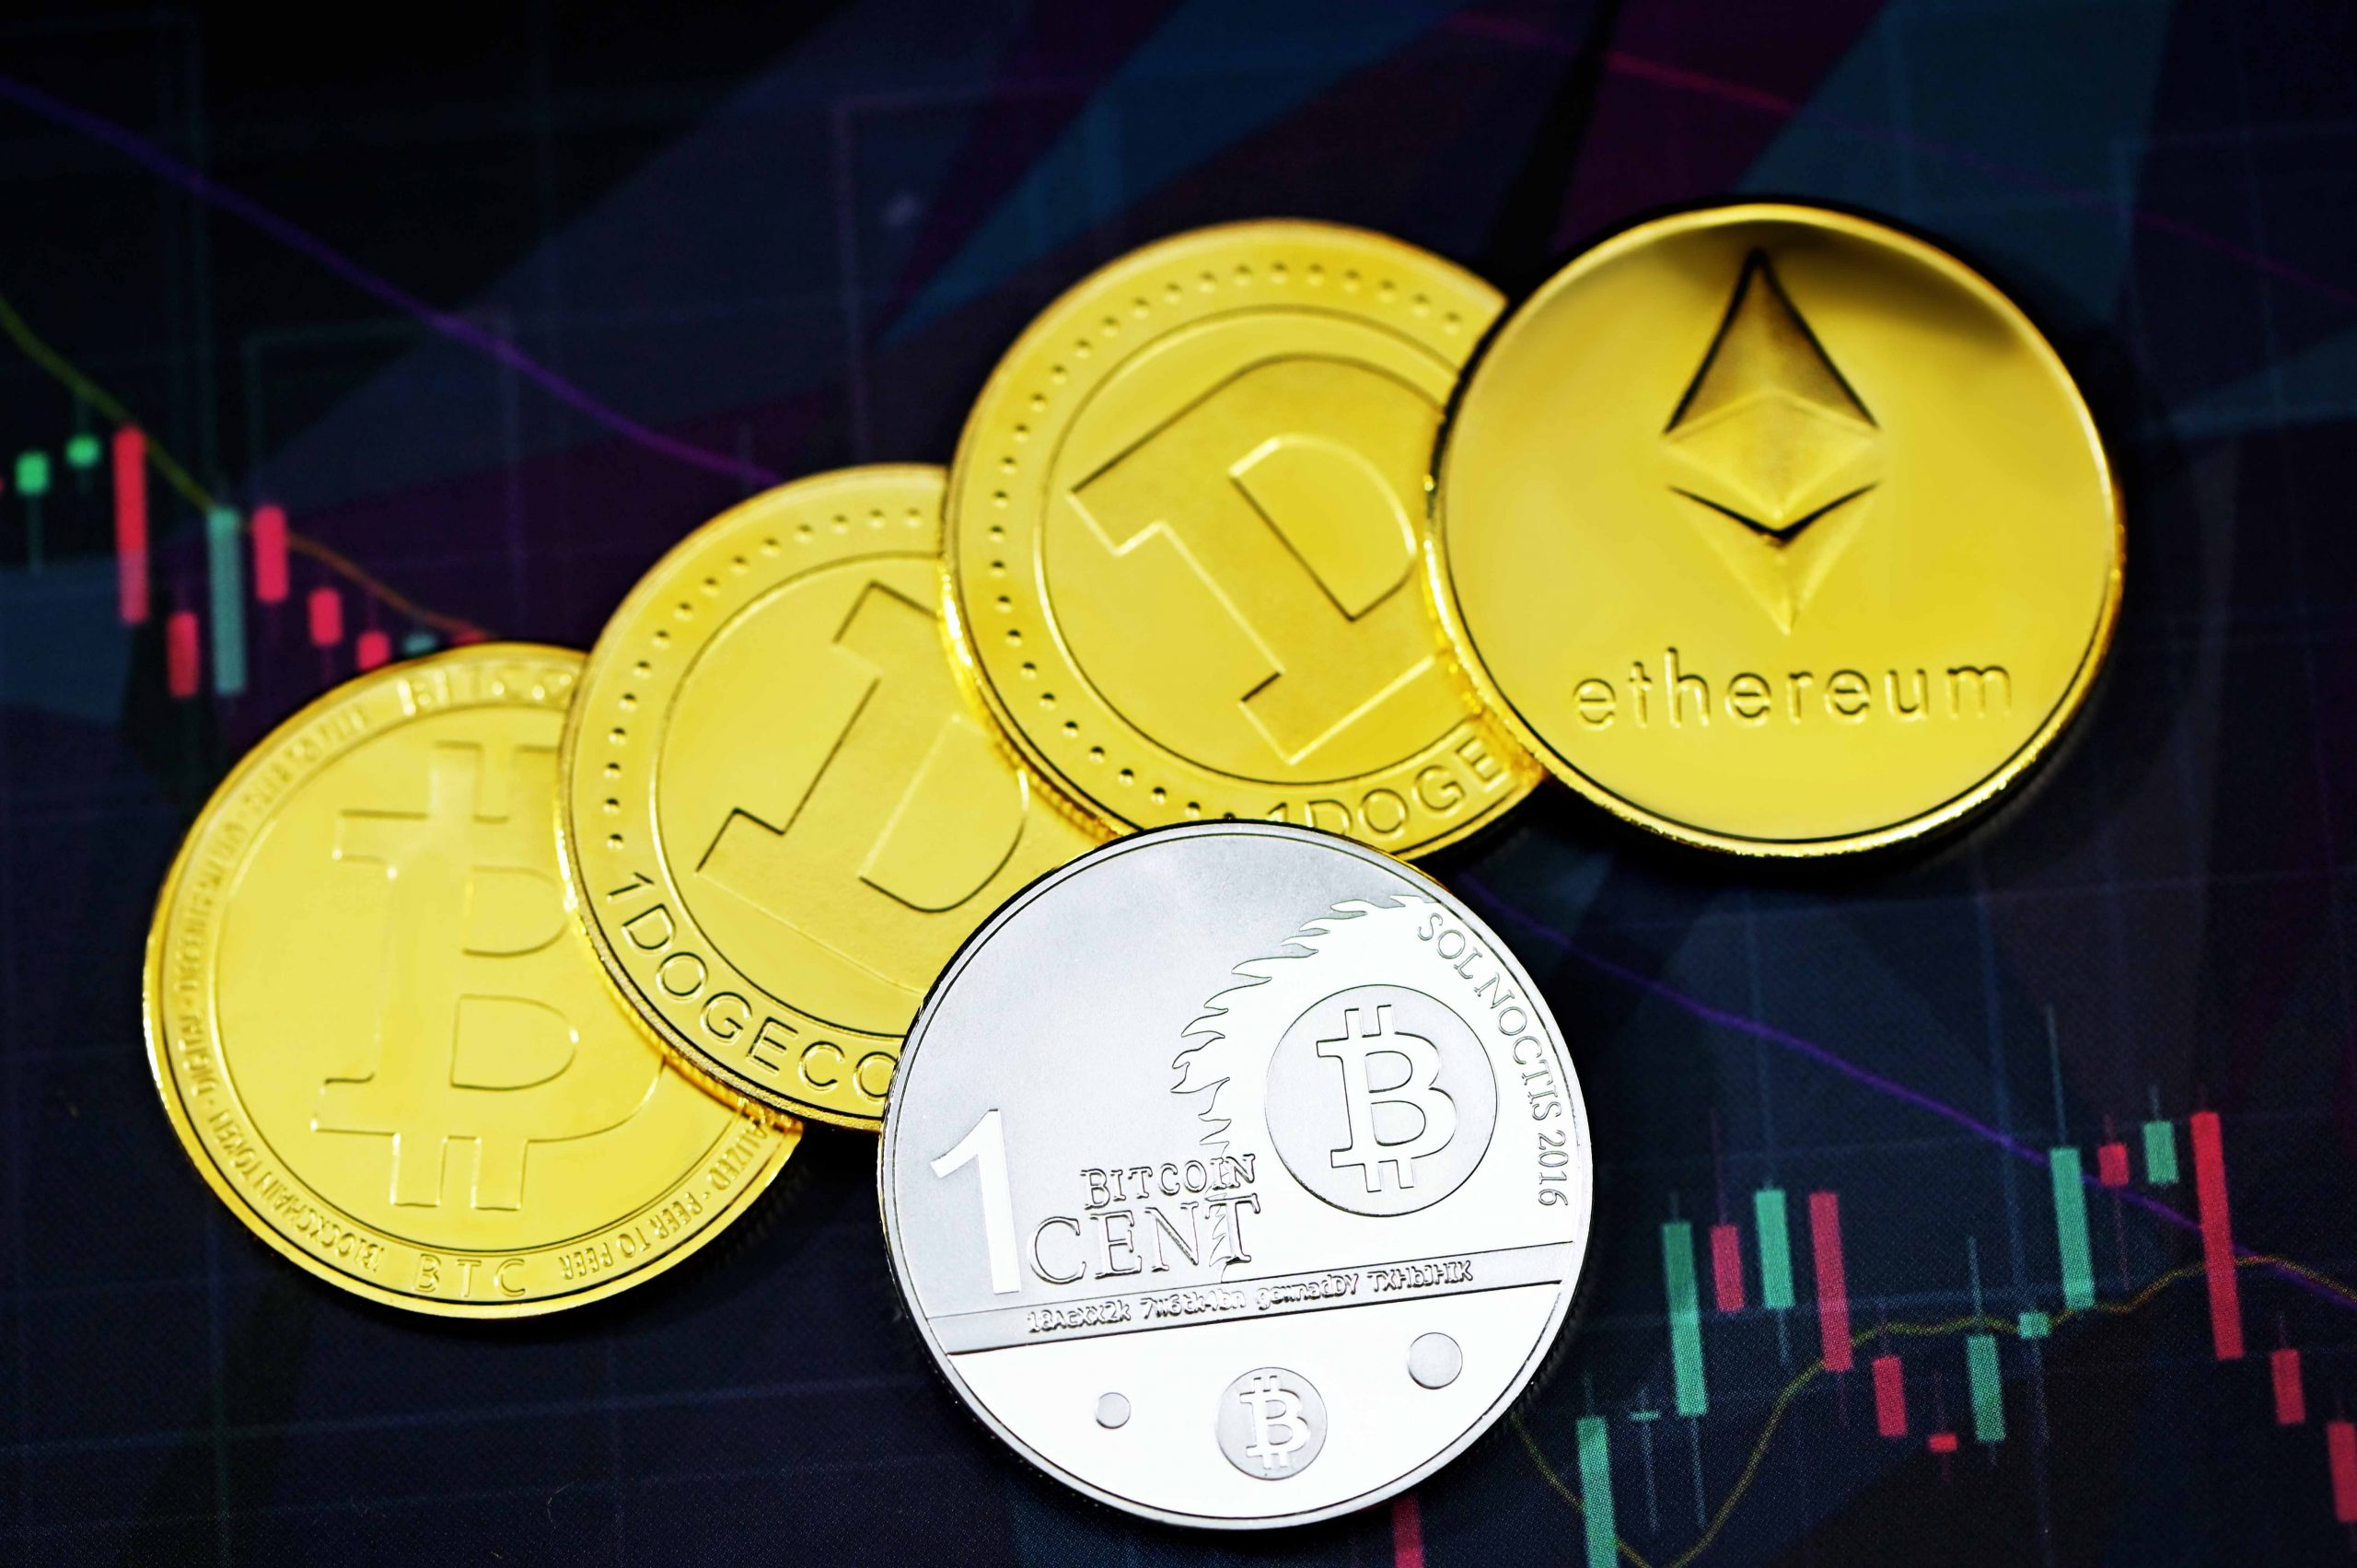 E2 Visa with Bitcoin Earnings